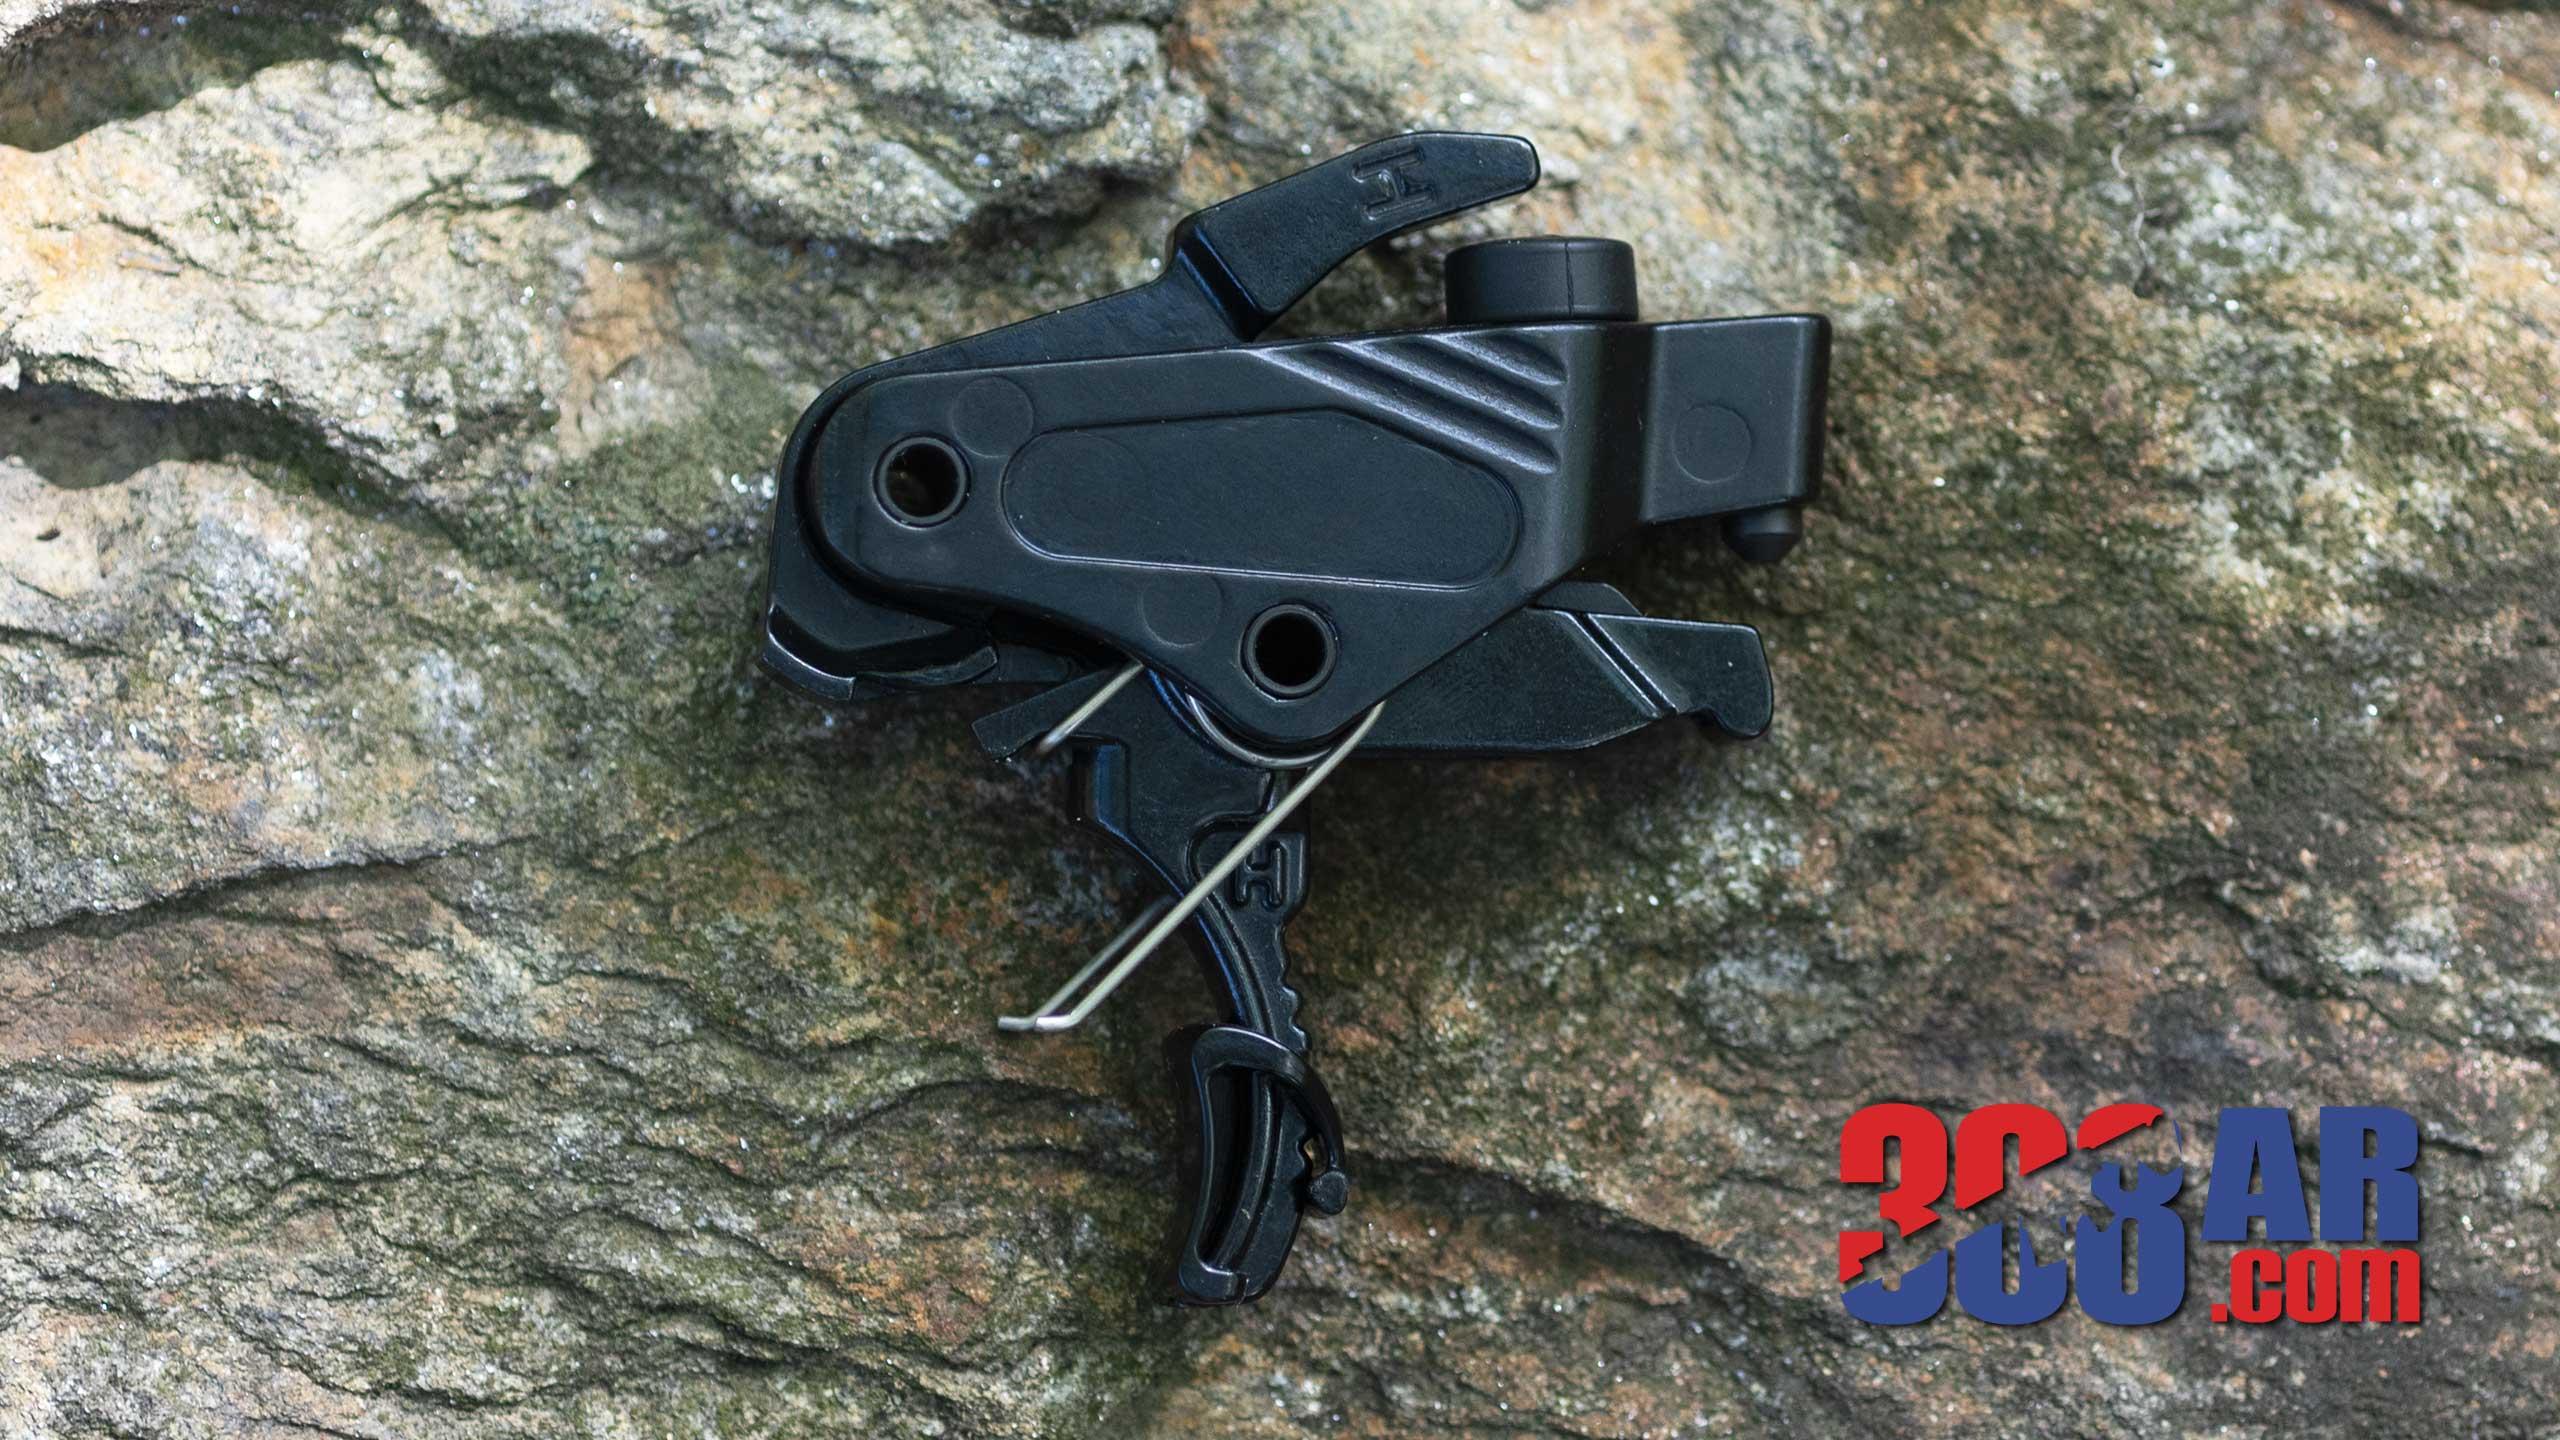 Hiperfire PDI Trigger